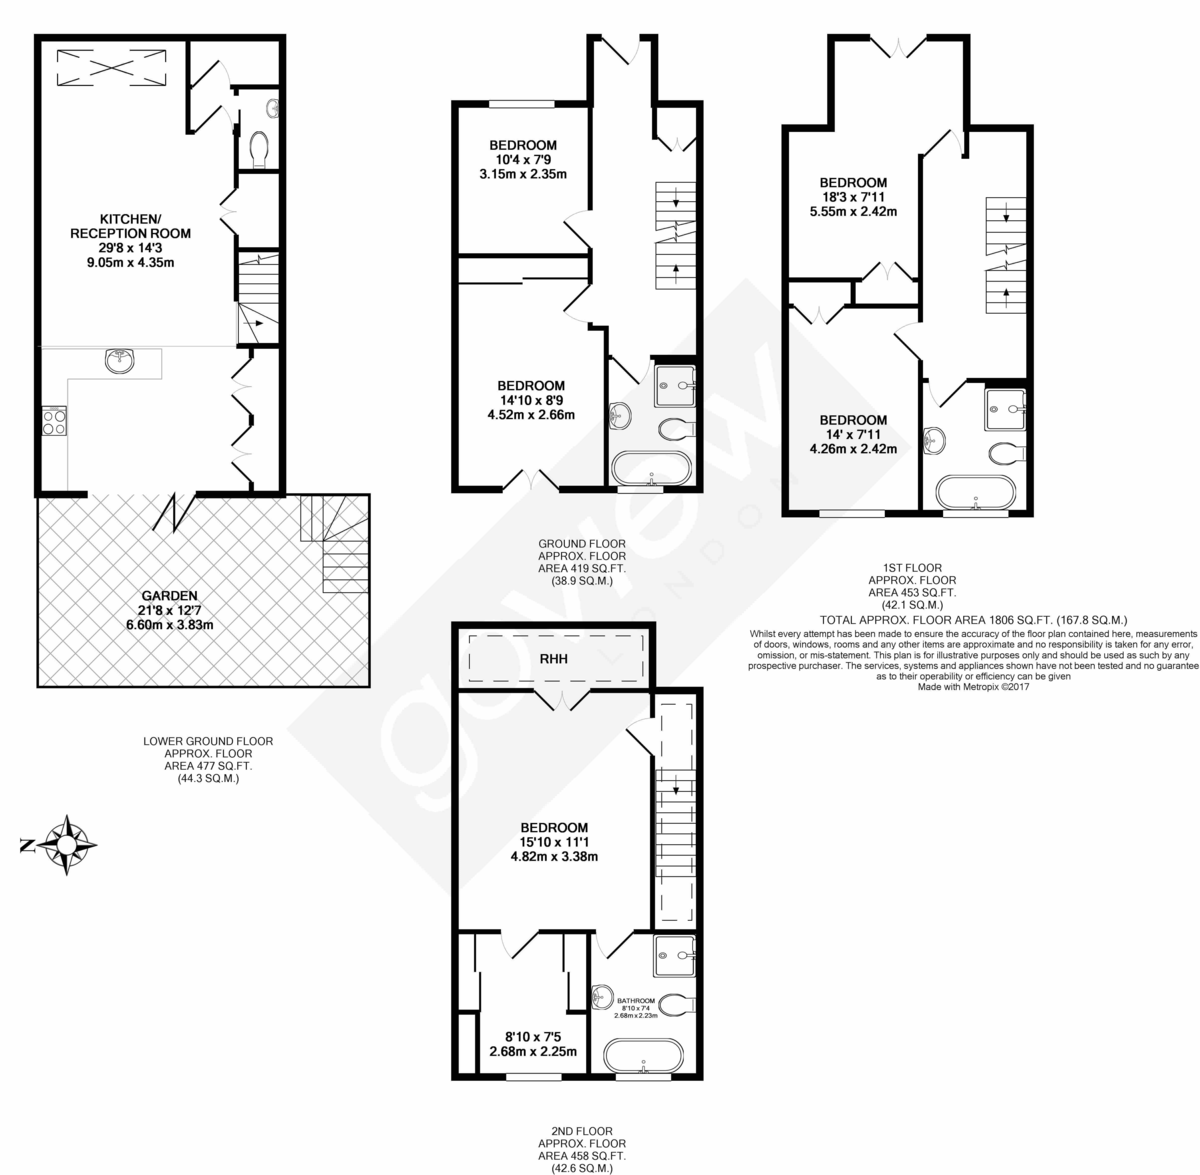 Residential Garage Plans furthermore Narrow long house plans besides 24 U0027 X 48 U0027 besides Shower Door Repair Parts besides Garage Door Signal. on vintage carriage house doors